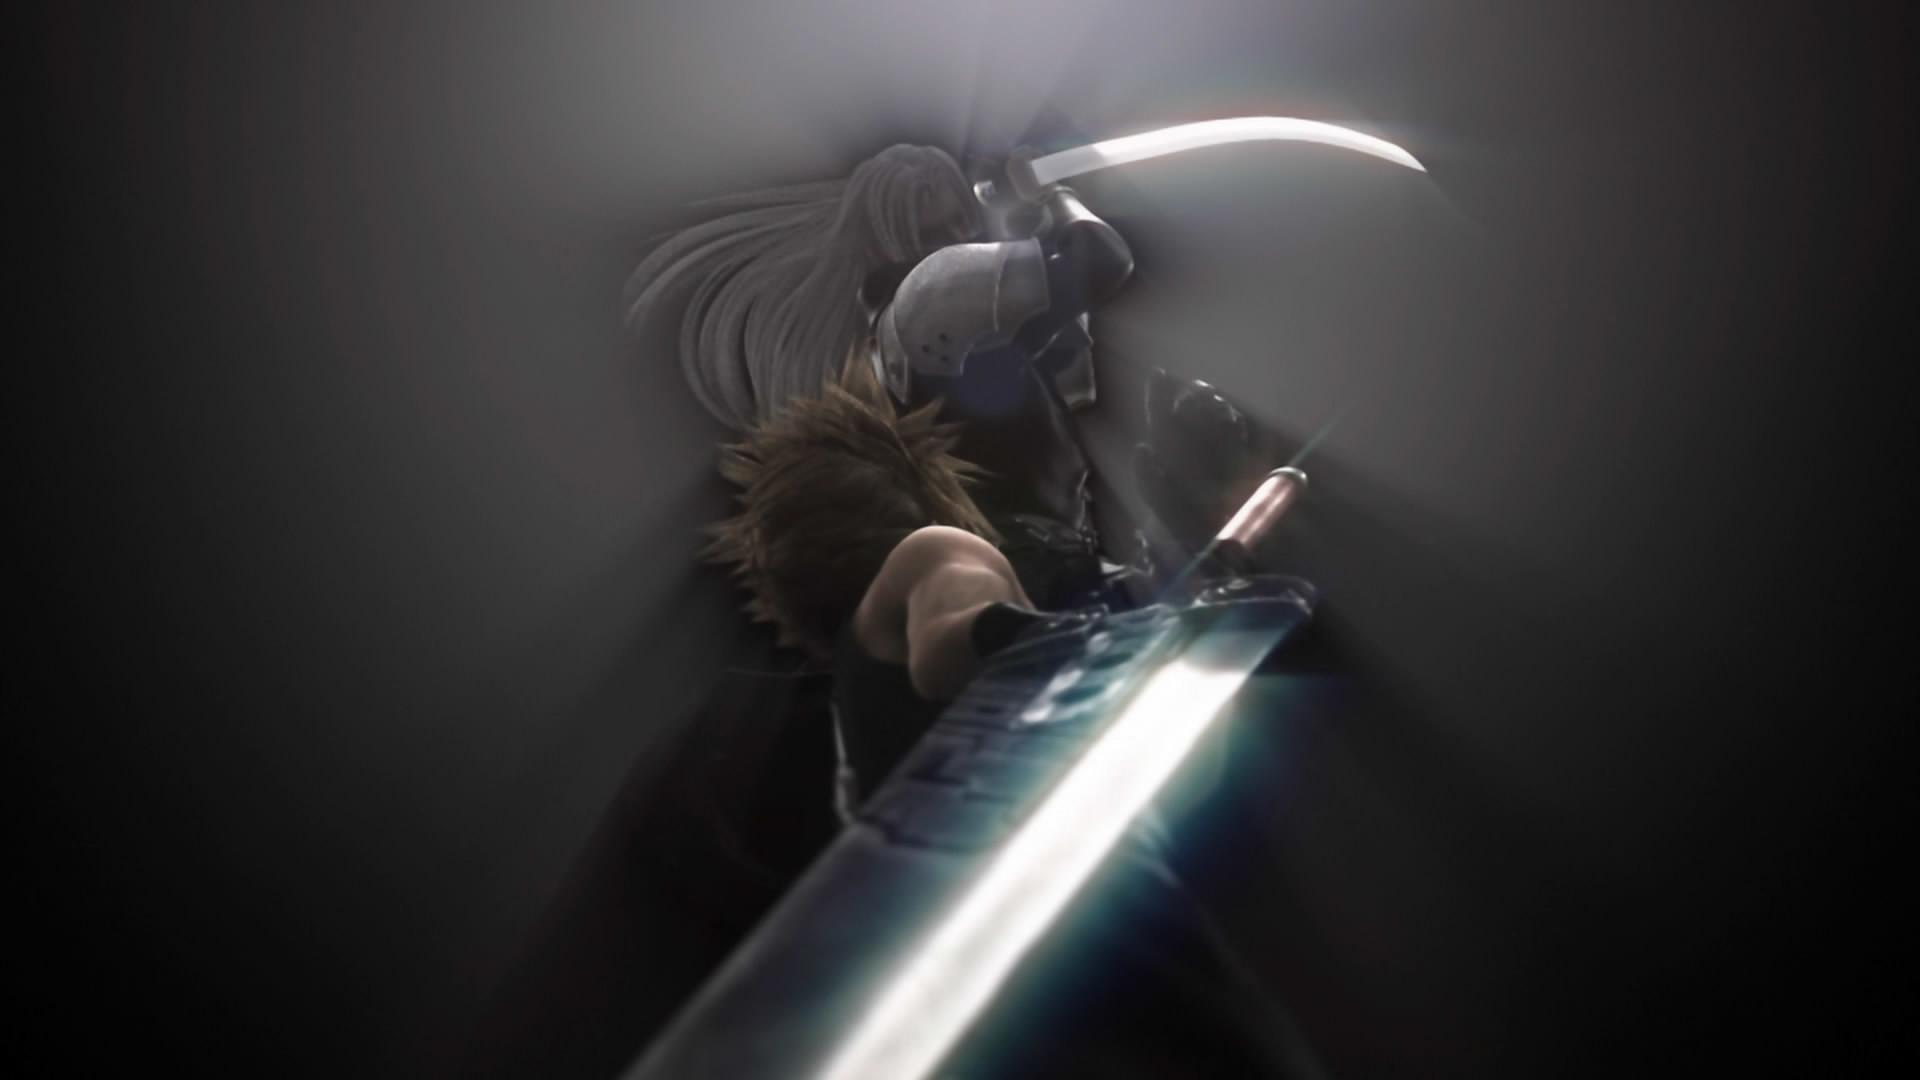 final fantasy vii advent children sephiroth buster sword cloud #9-sg